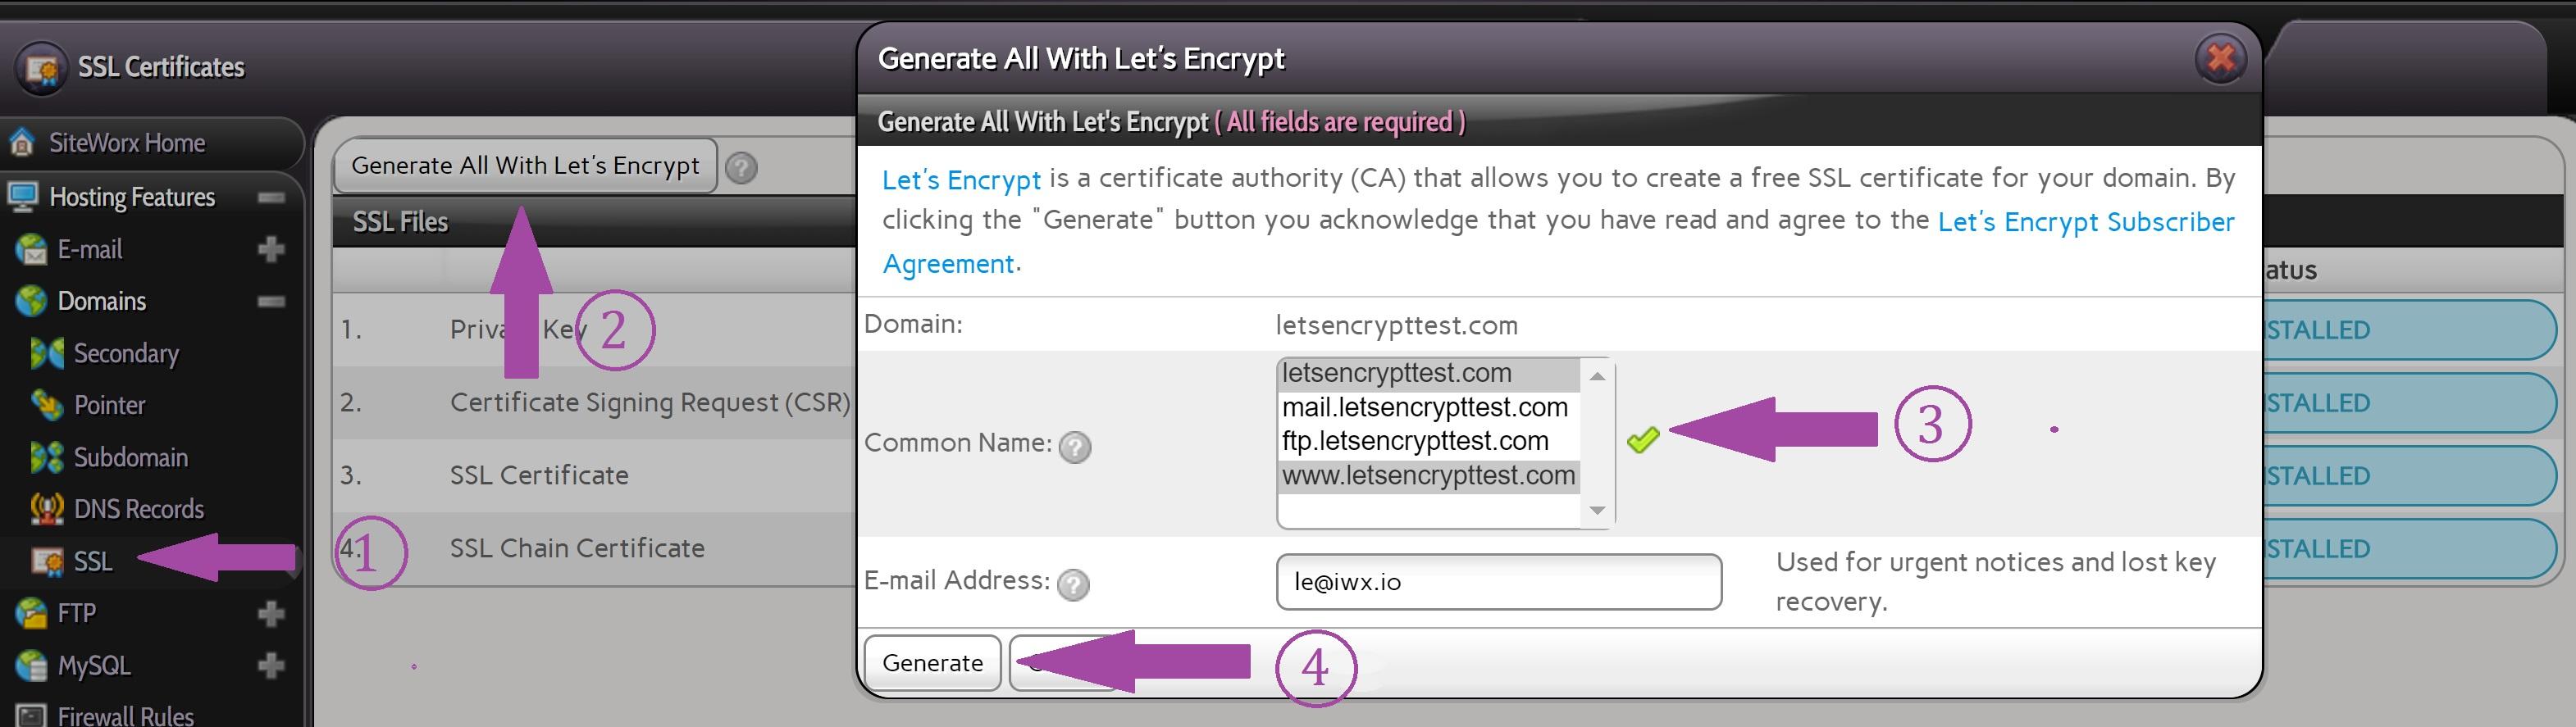 lets encrypt 3